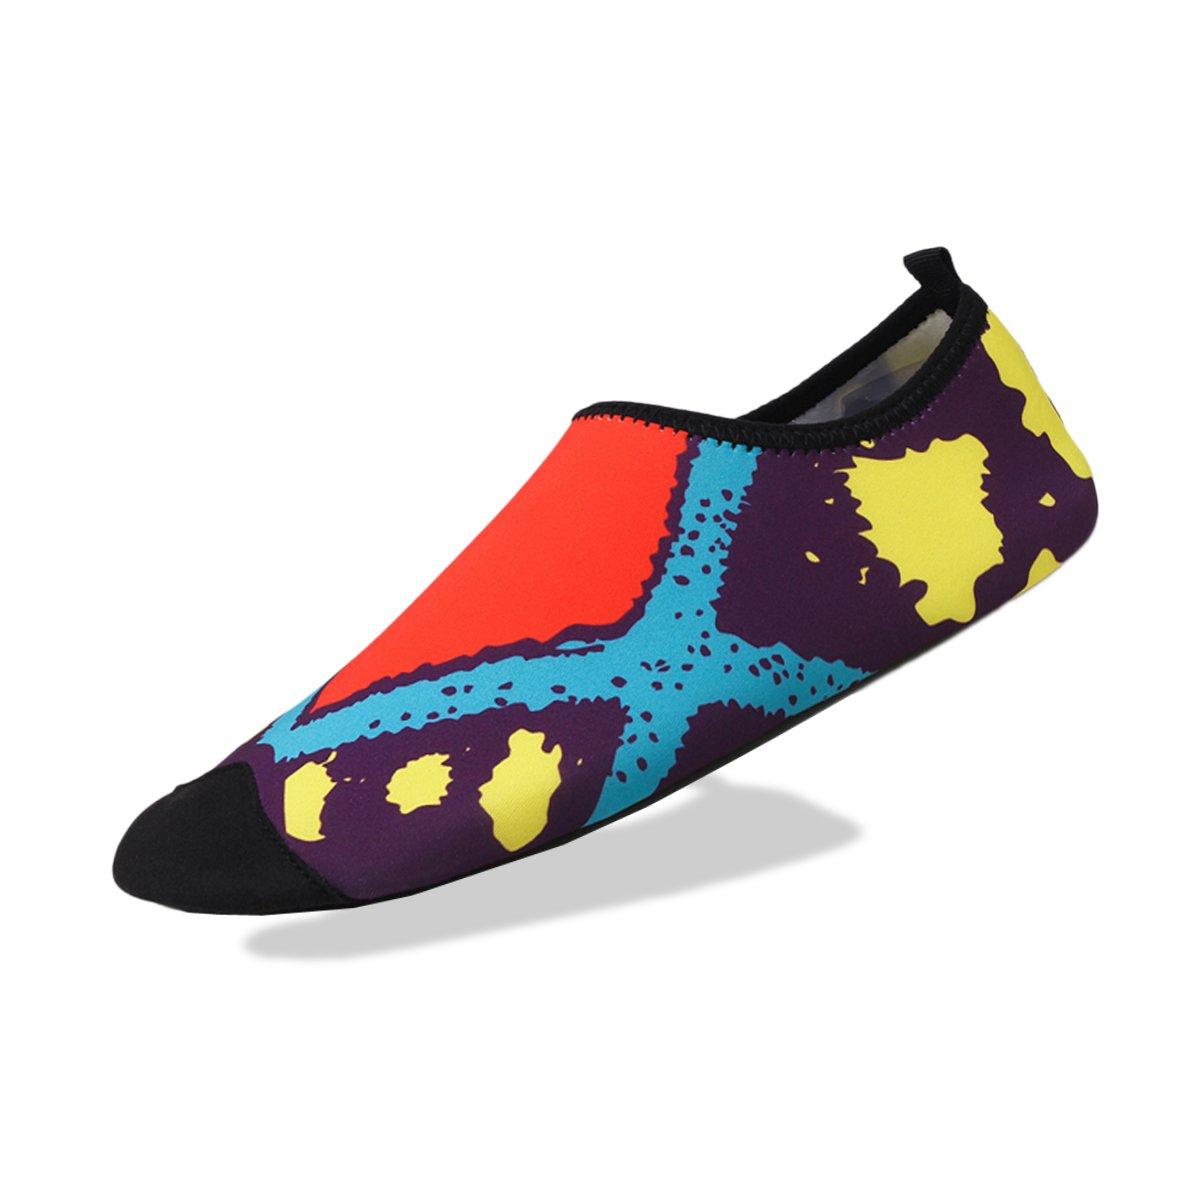 Hongyuns Water Sports Shoes Barefoot Quick-Dry Aqua Yoga Socks Slip-On for Men Women Kids (Women:9.5-10.5/Men:7.5-8.5, Red-Yellow)